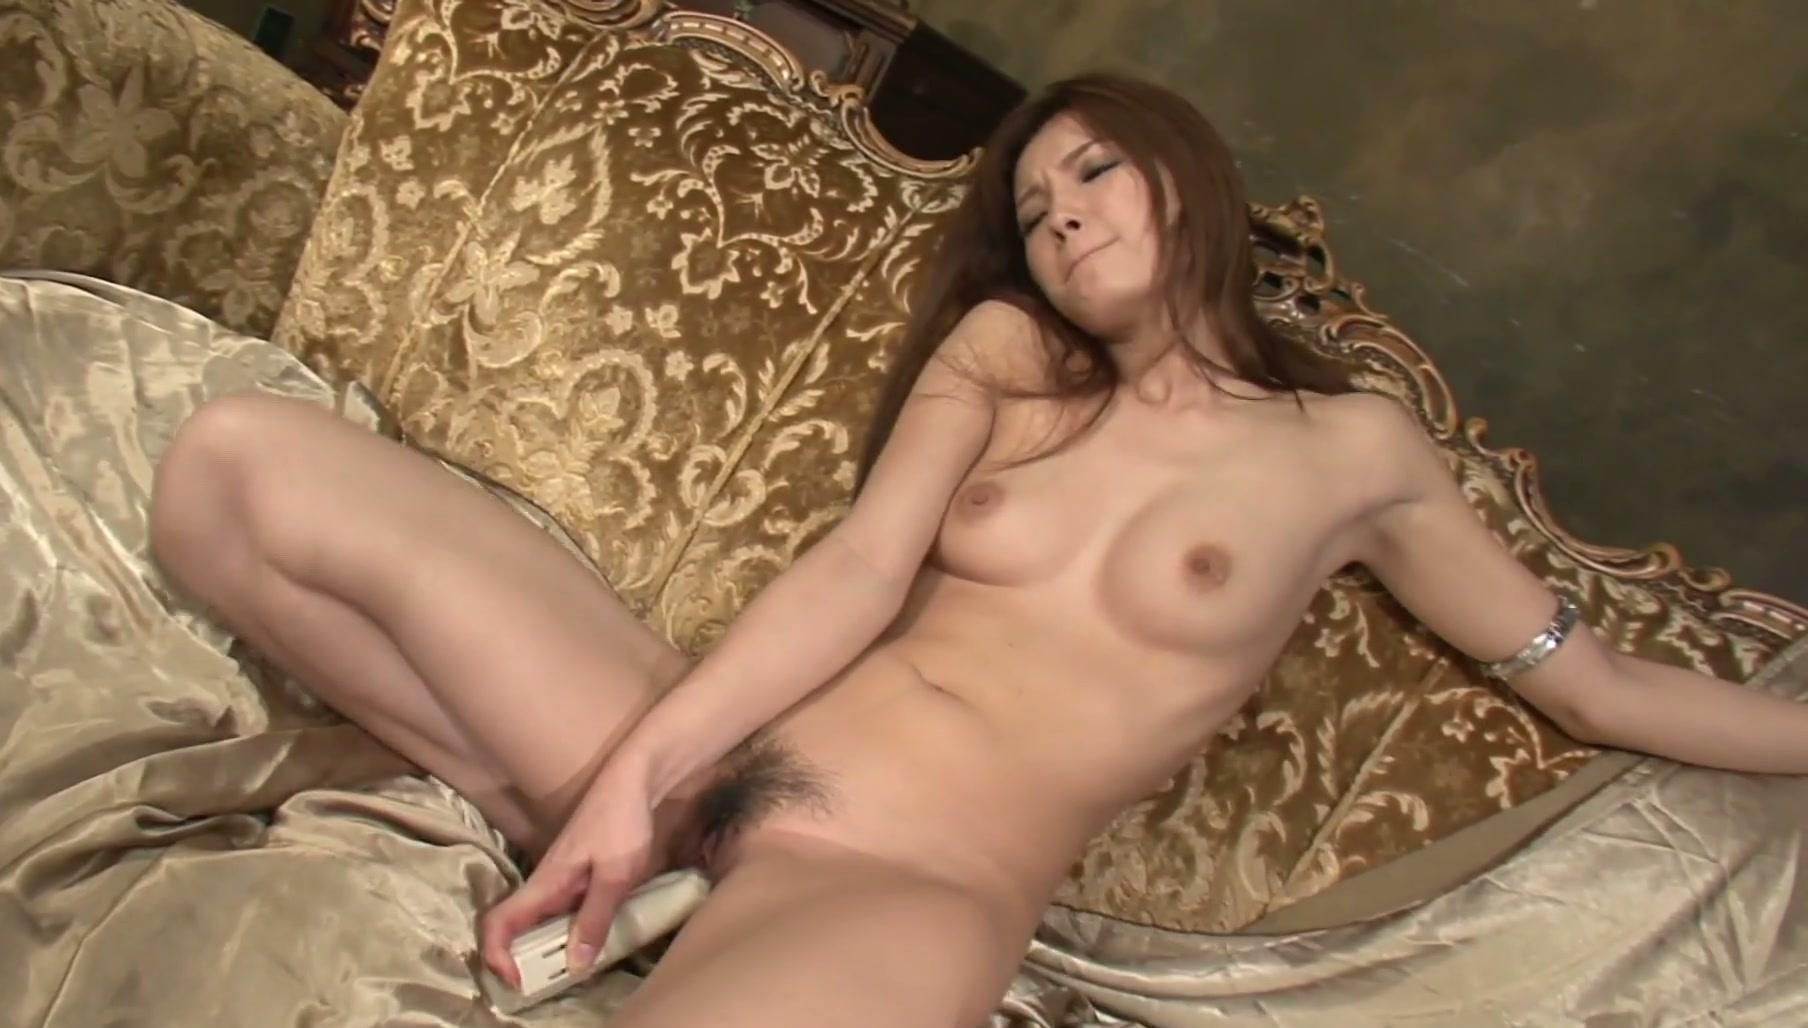 massage free erotic lesbian